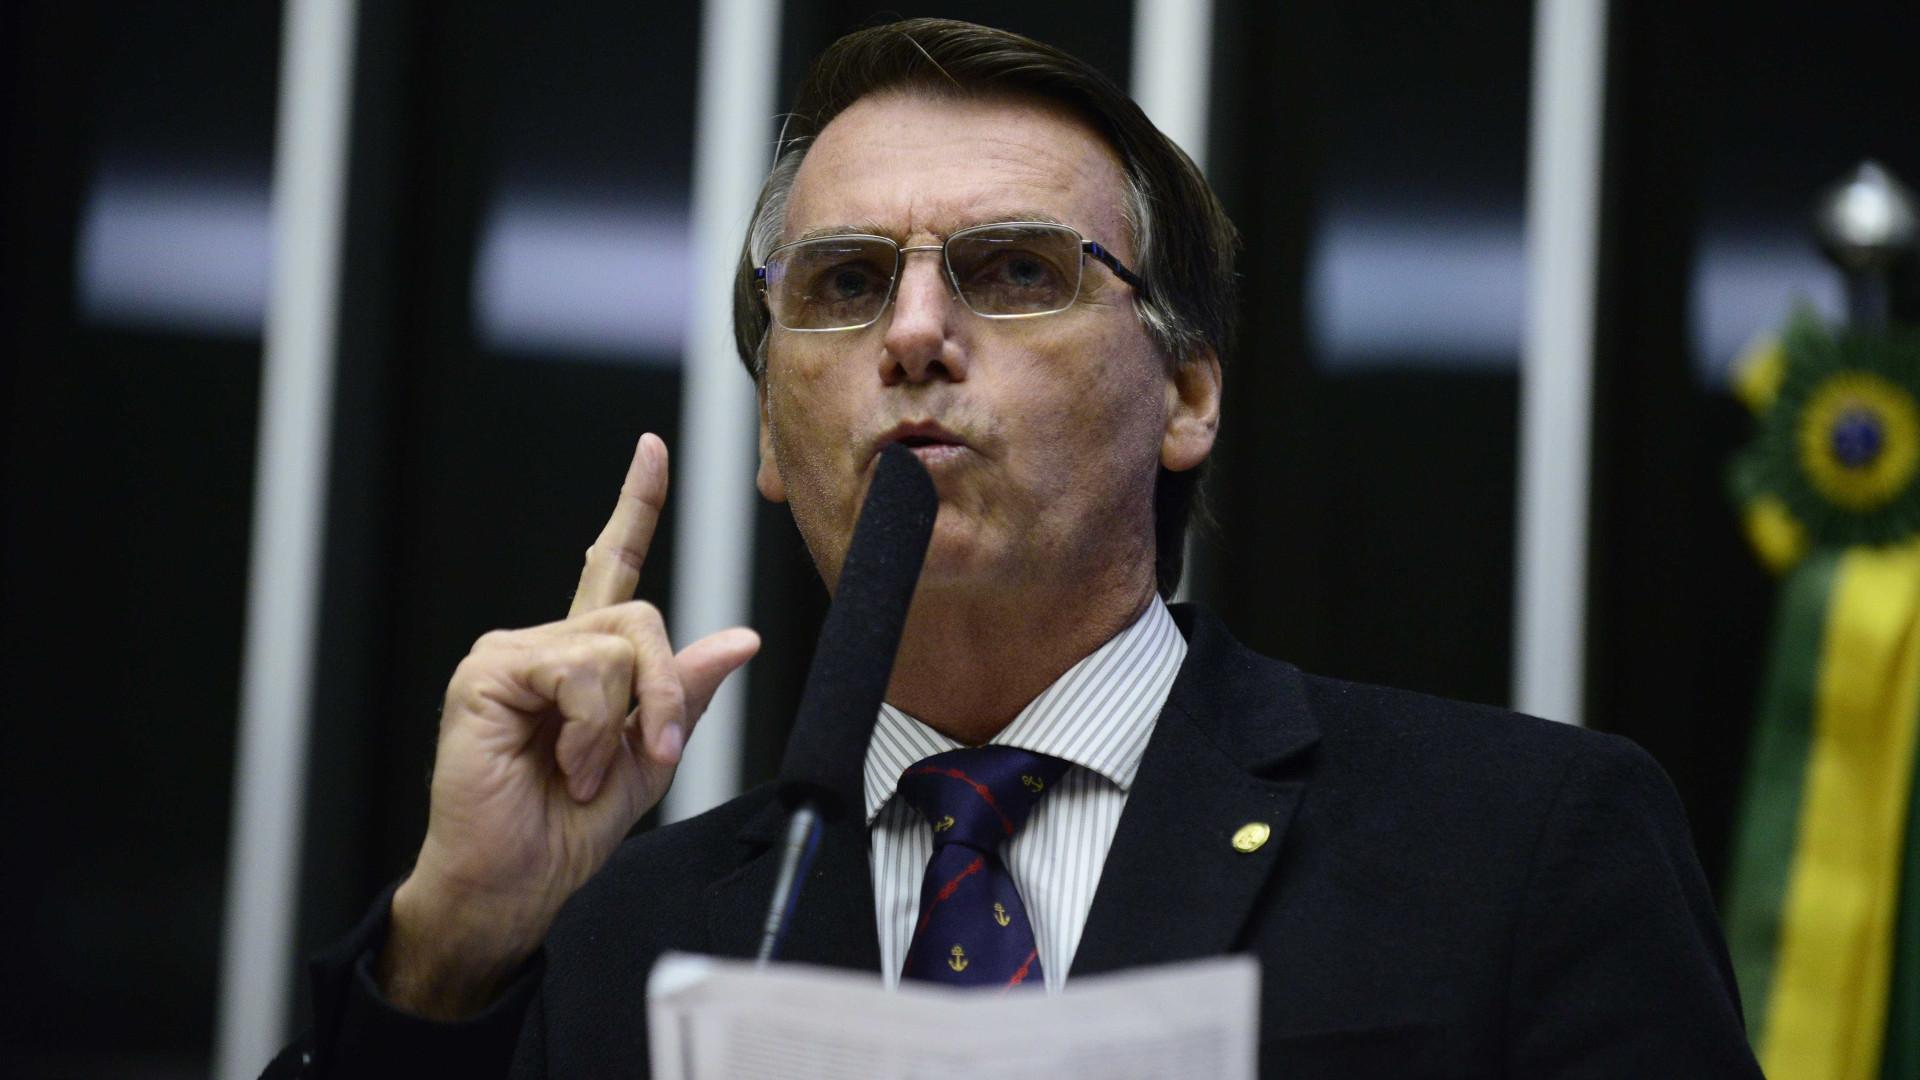 Bolsonaro é condenado a pagar R$ 150 mil por ofensas homofóbicas